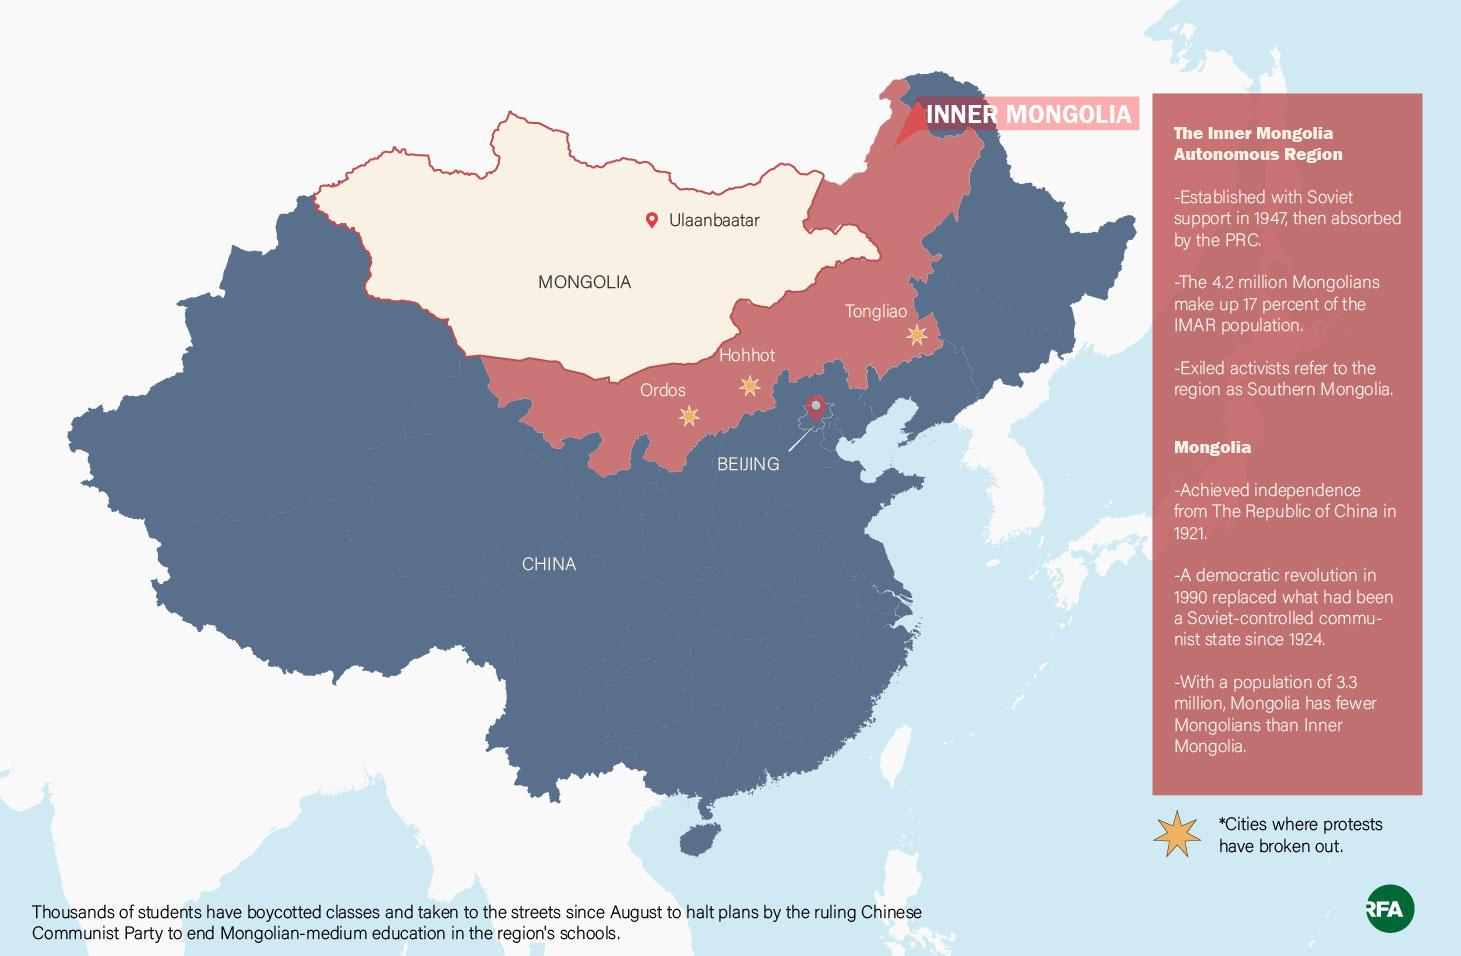 Mongolia and the Inner Mongolia Autonomous Region of China.